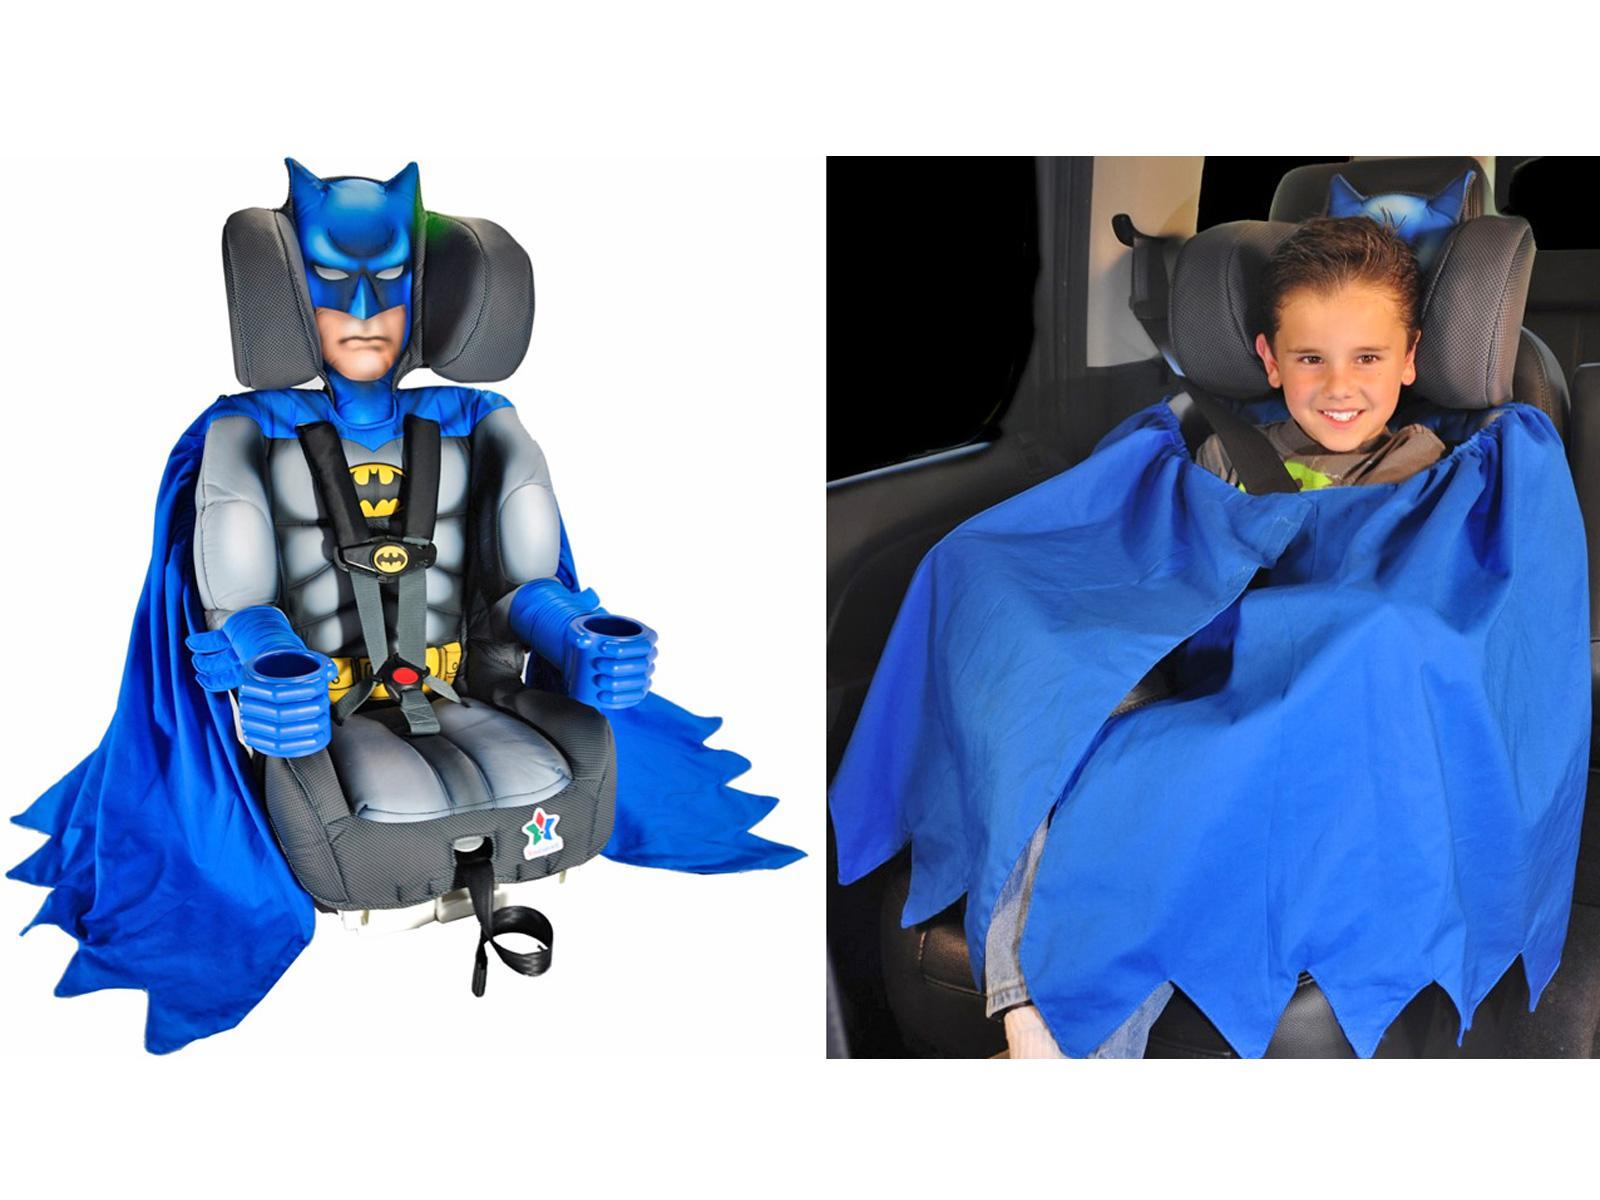 Cosmos girls sillas de seguridad para ni os estilo for Sillas de seguridad para ninos